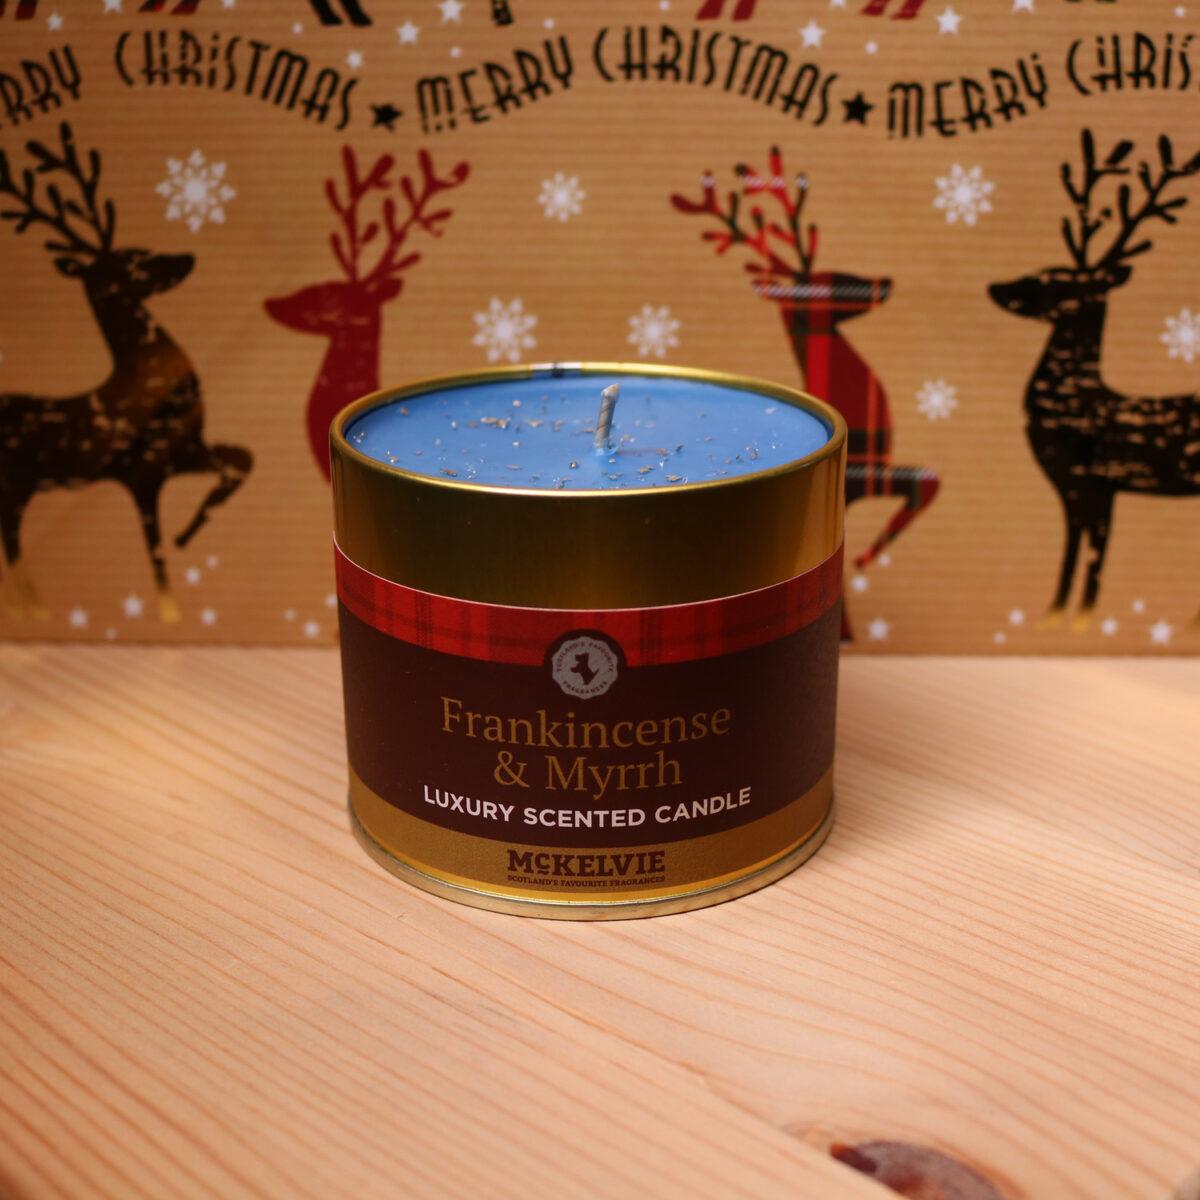 Frankincense & Mhyrrh Scented Candle Tin